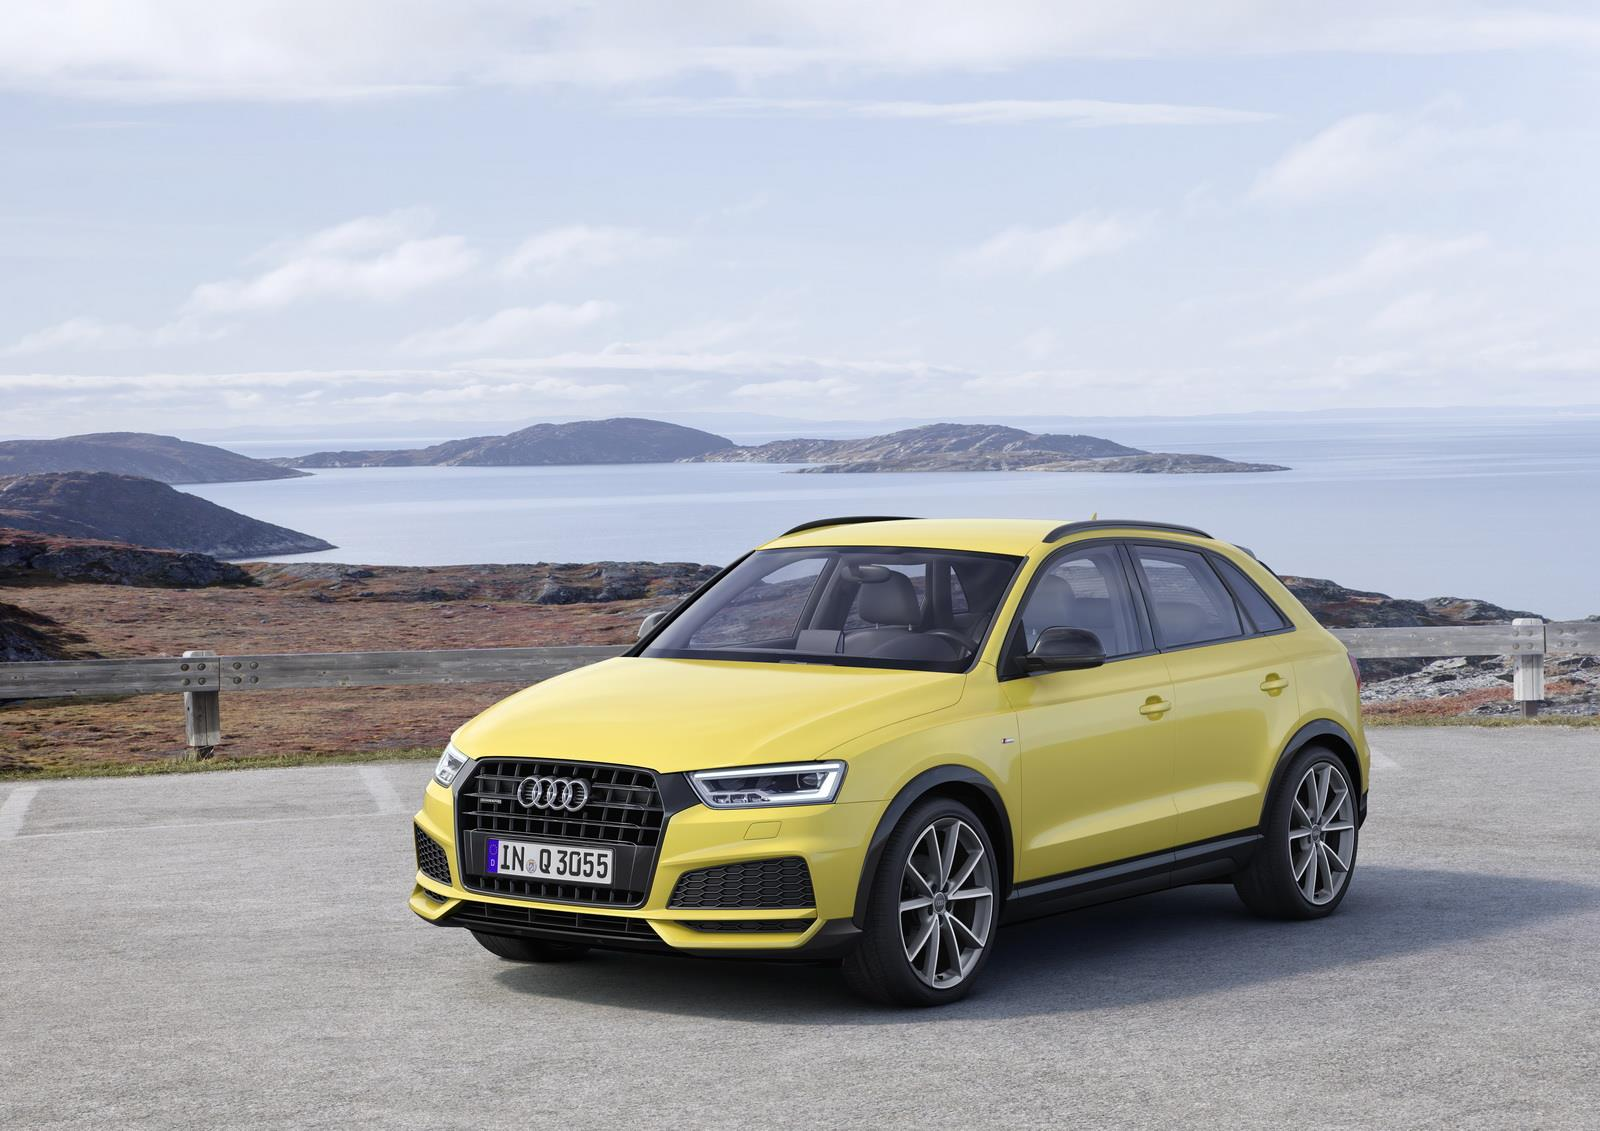 2017 Audi Q3 photo gallery